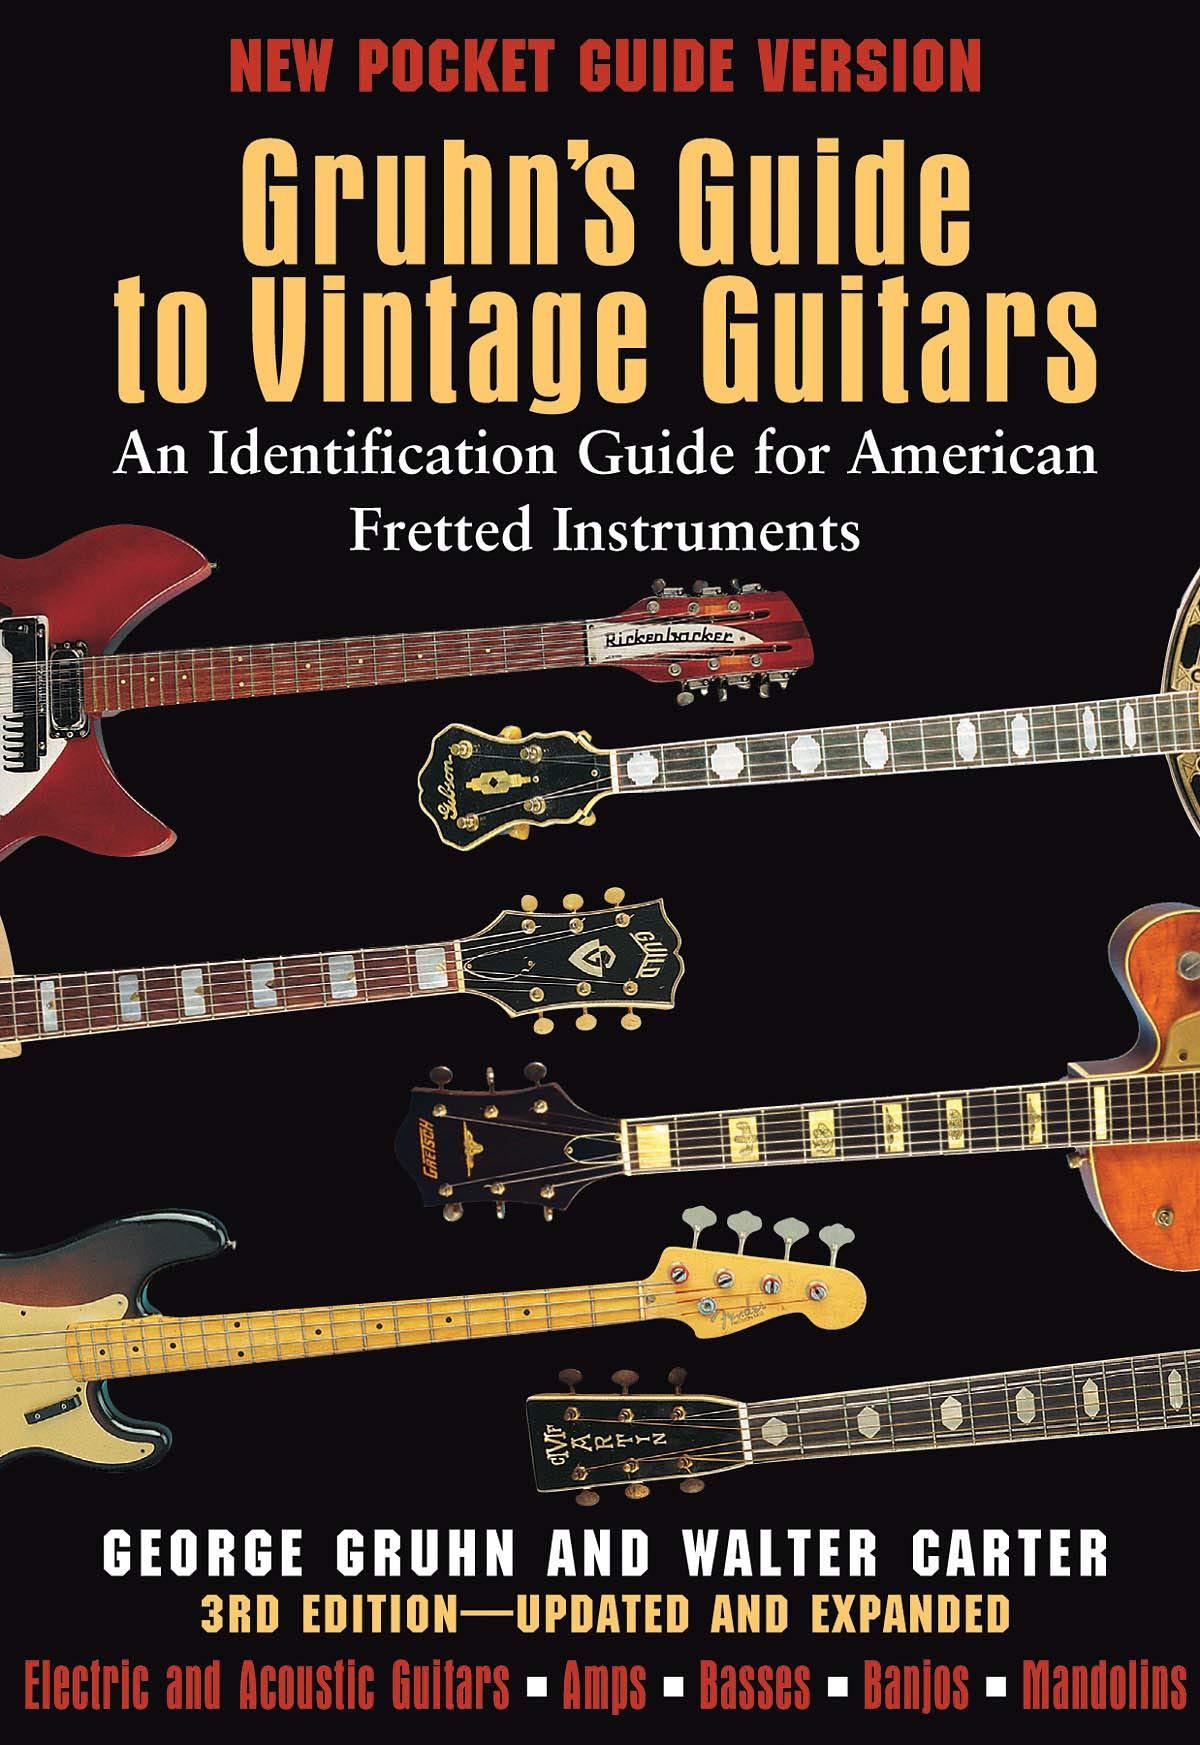 Dating vintage Gibson Les Paul badrum handfat propp krok upp